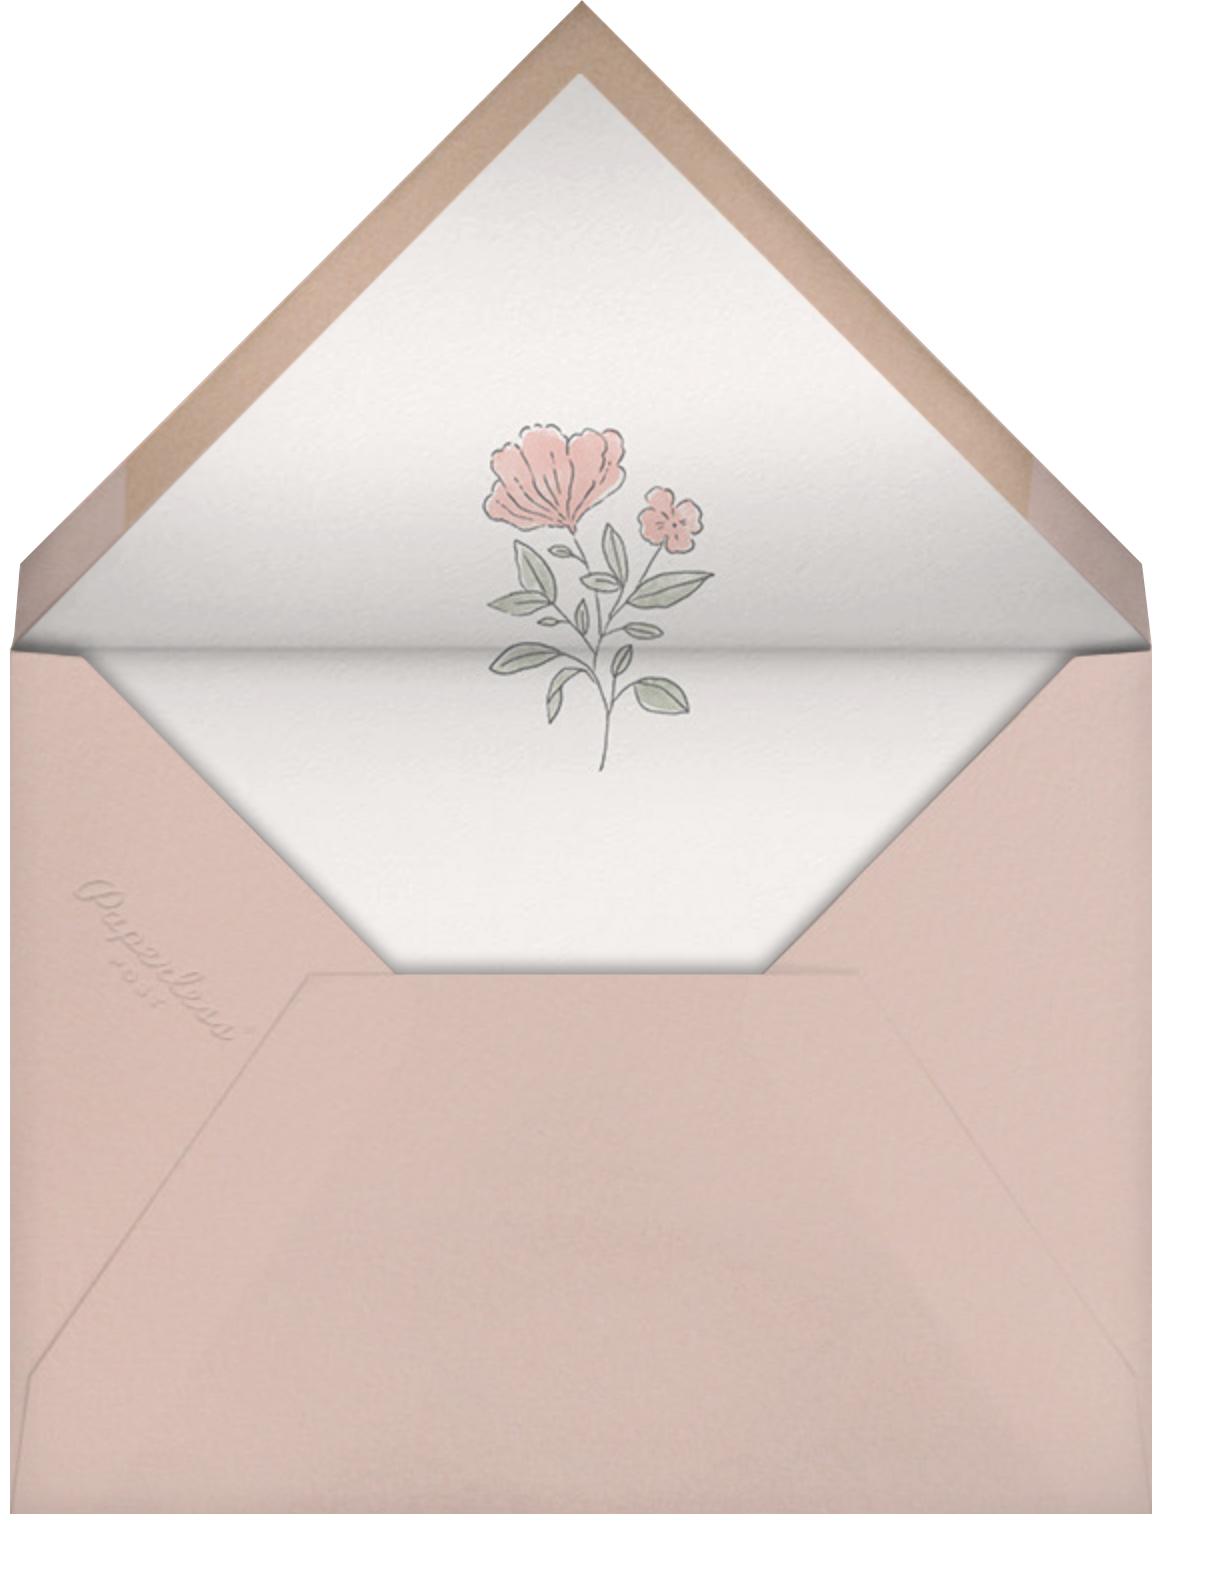 Antique Flowers - Paperless Post - Bridal shower - envelope back